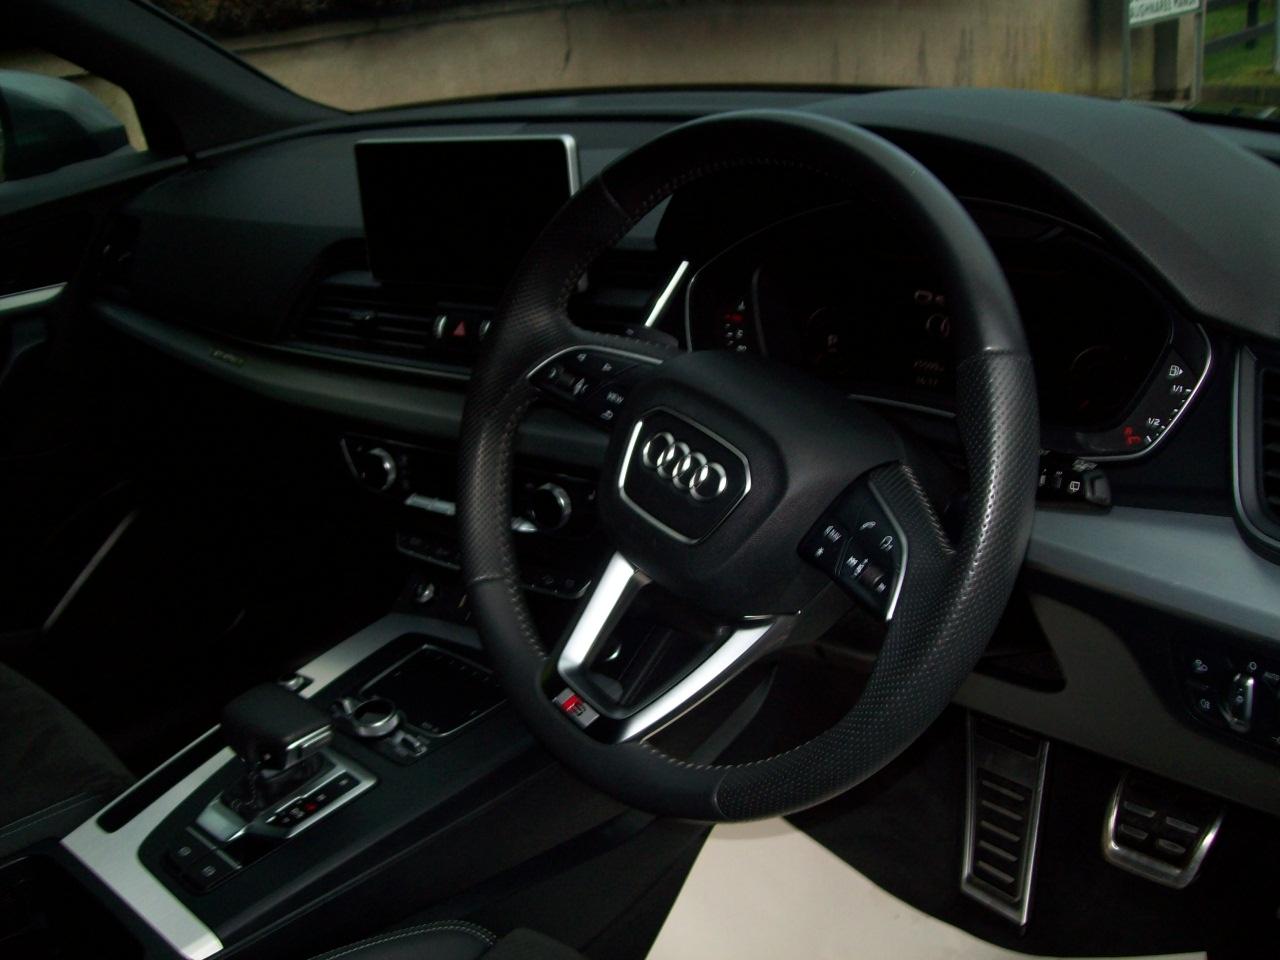 2019 Audi Q5 Diesel Tiptronic Automatic – Derek Loane Motors full